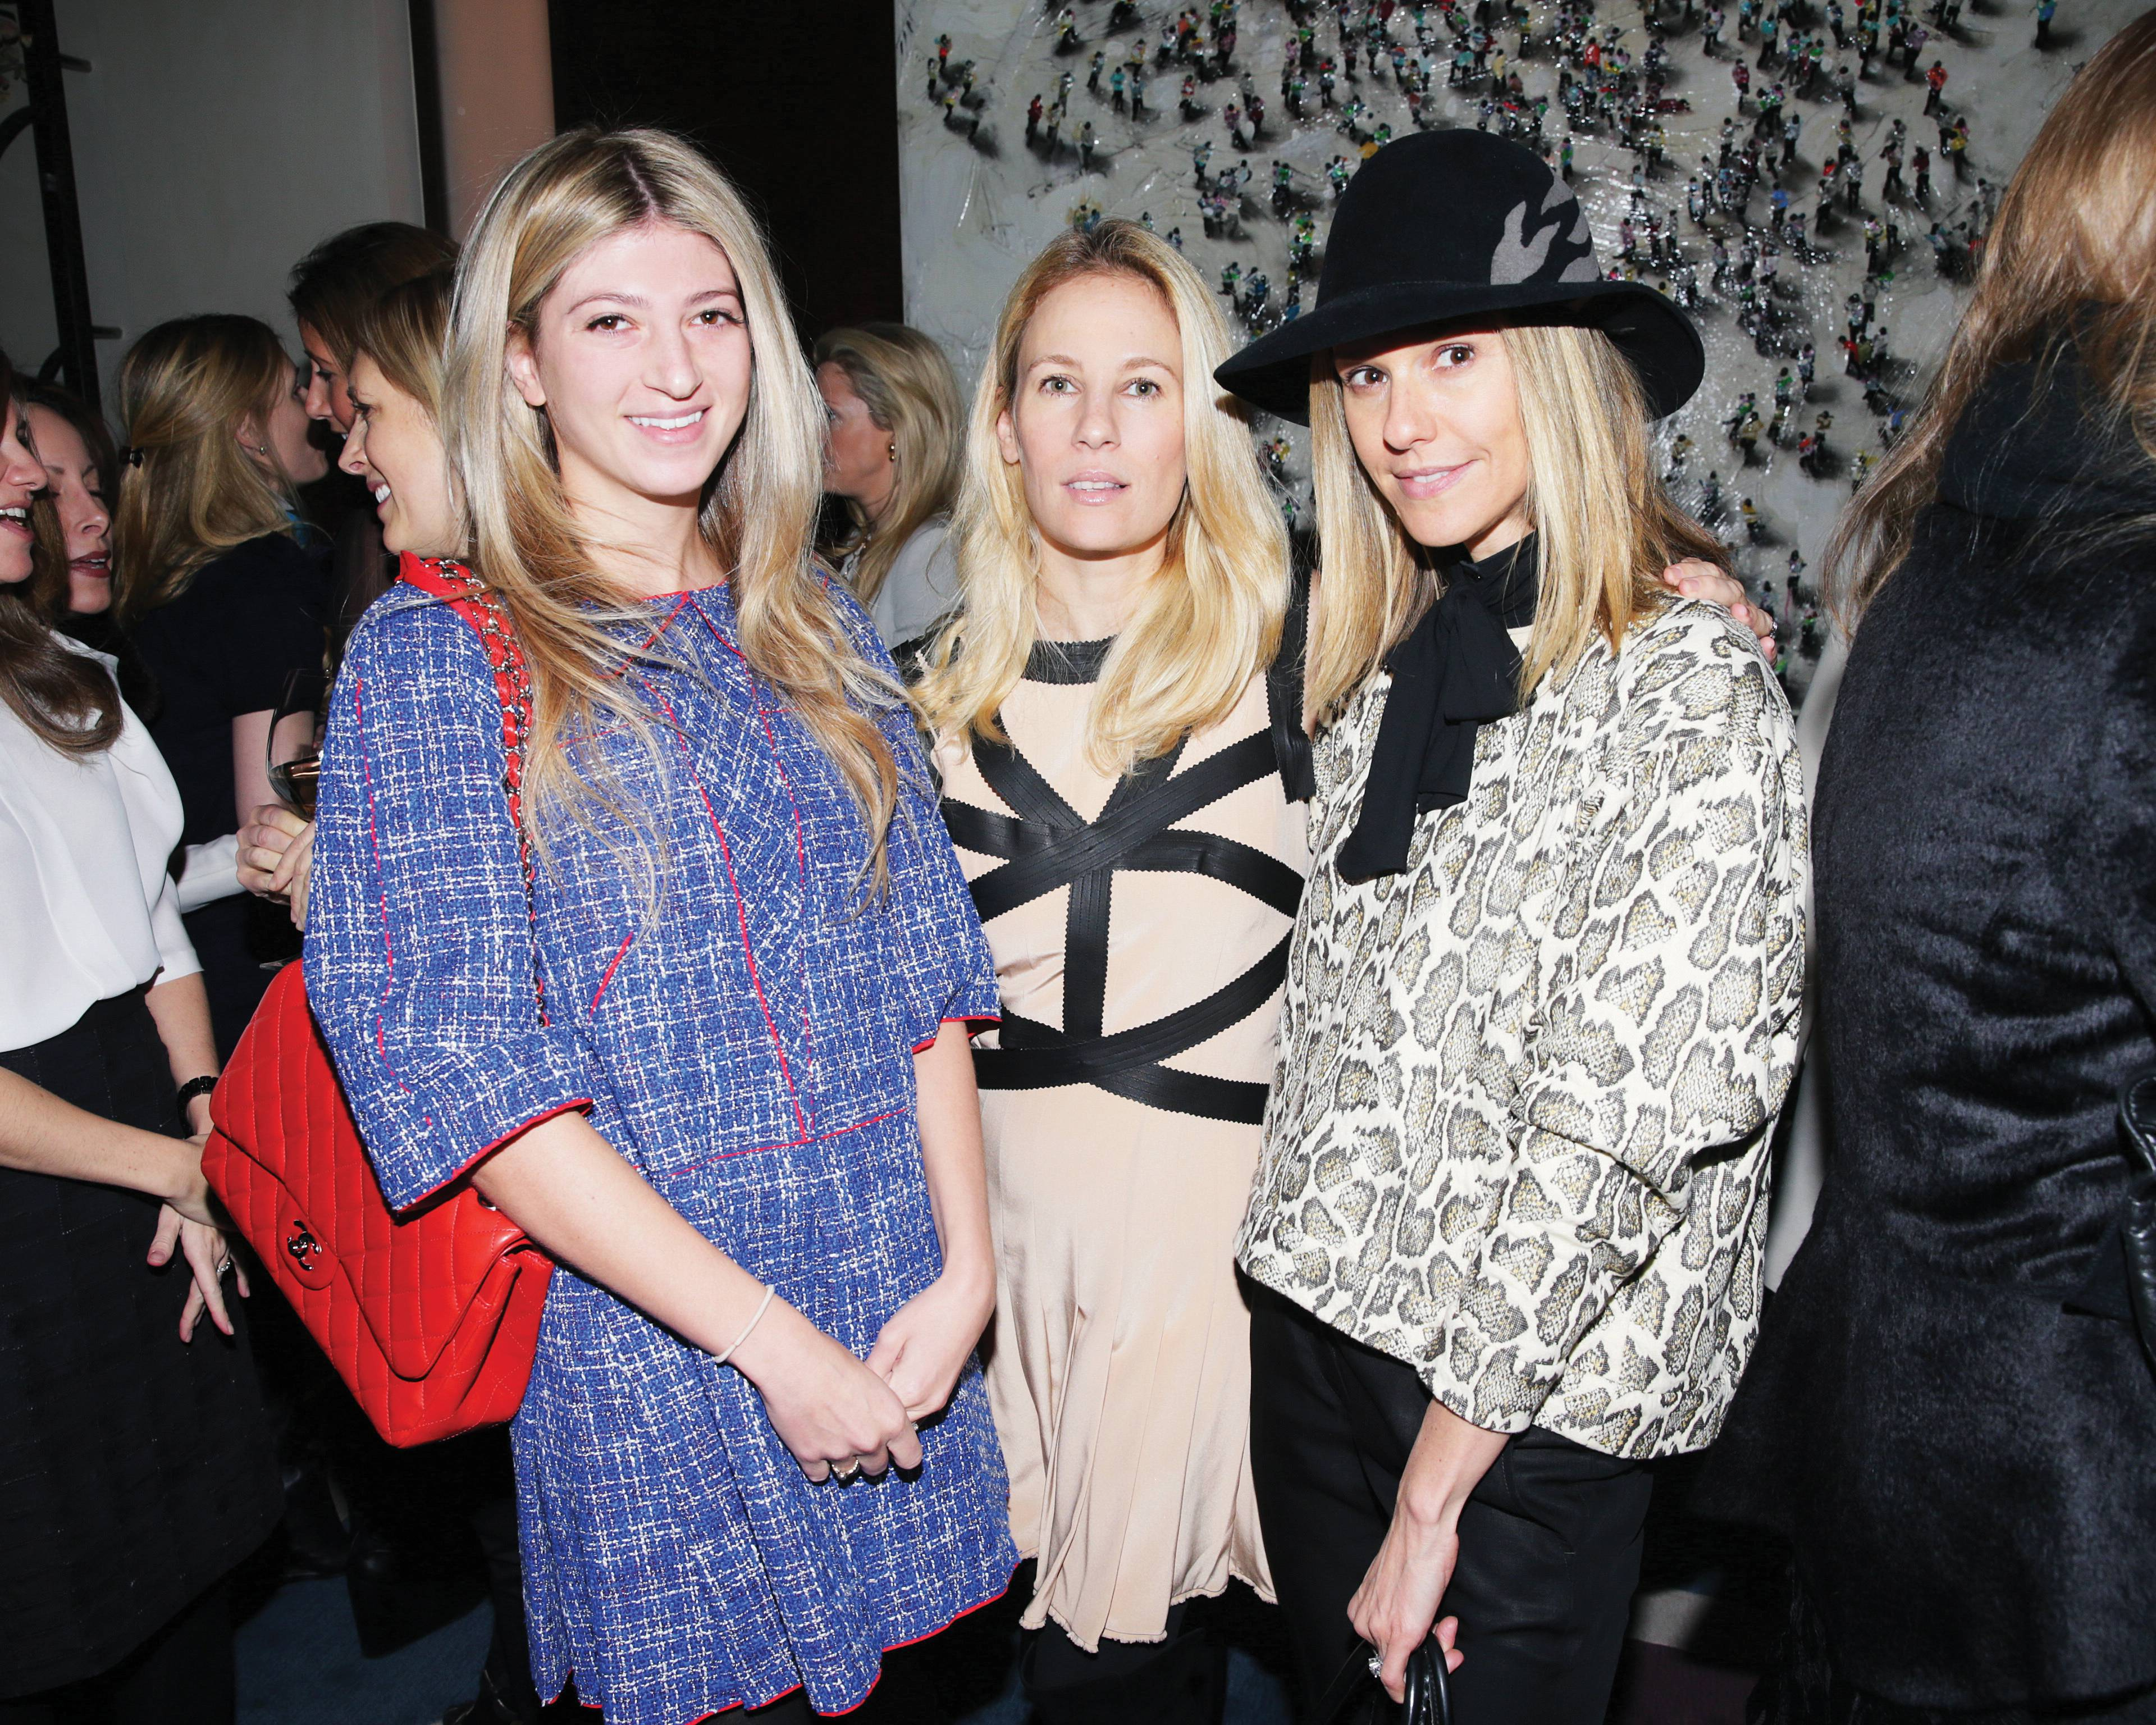 Sarah-Hoover,-Rebekah-McCabe-and-Eleanor-Ylvisaker